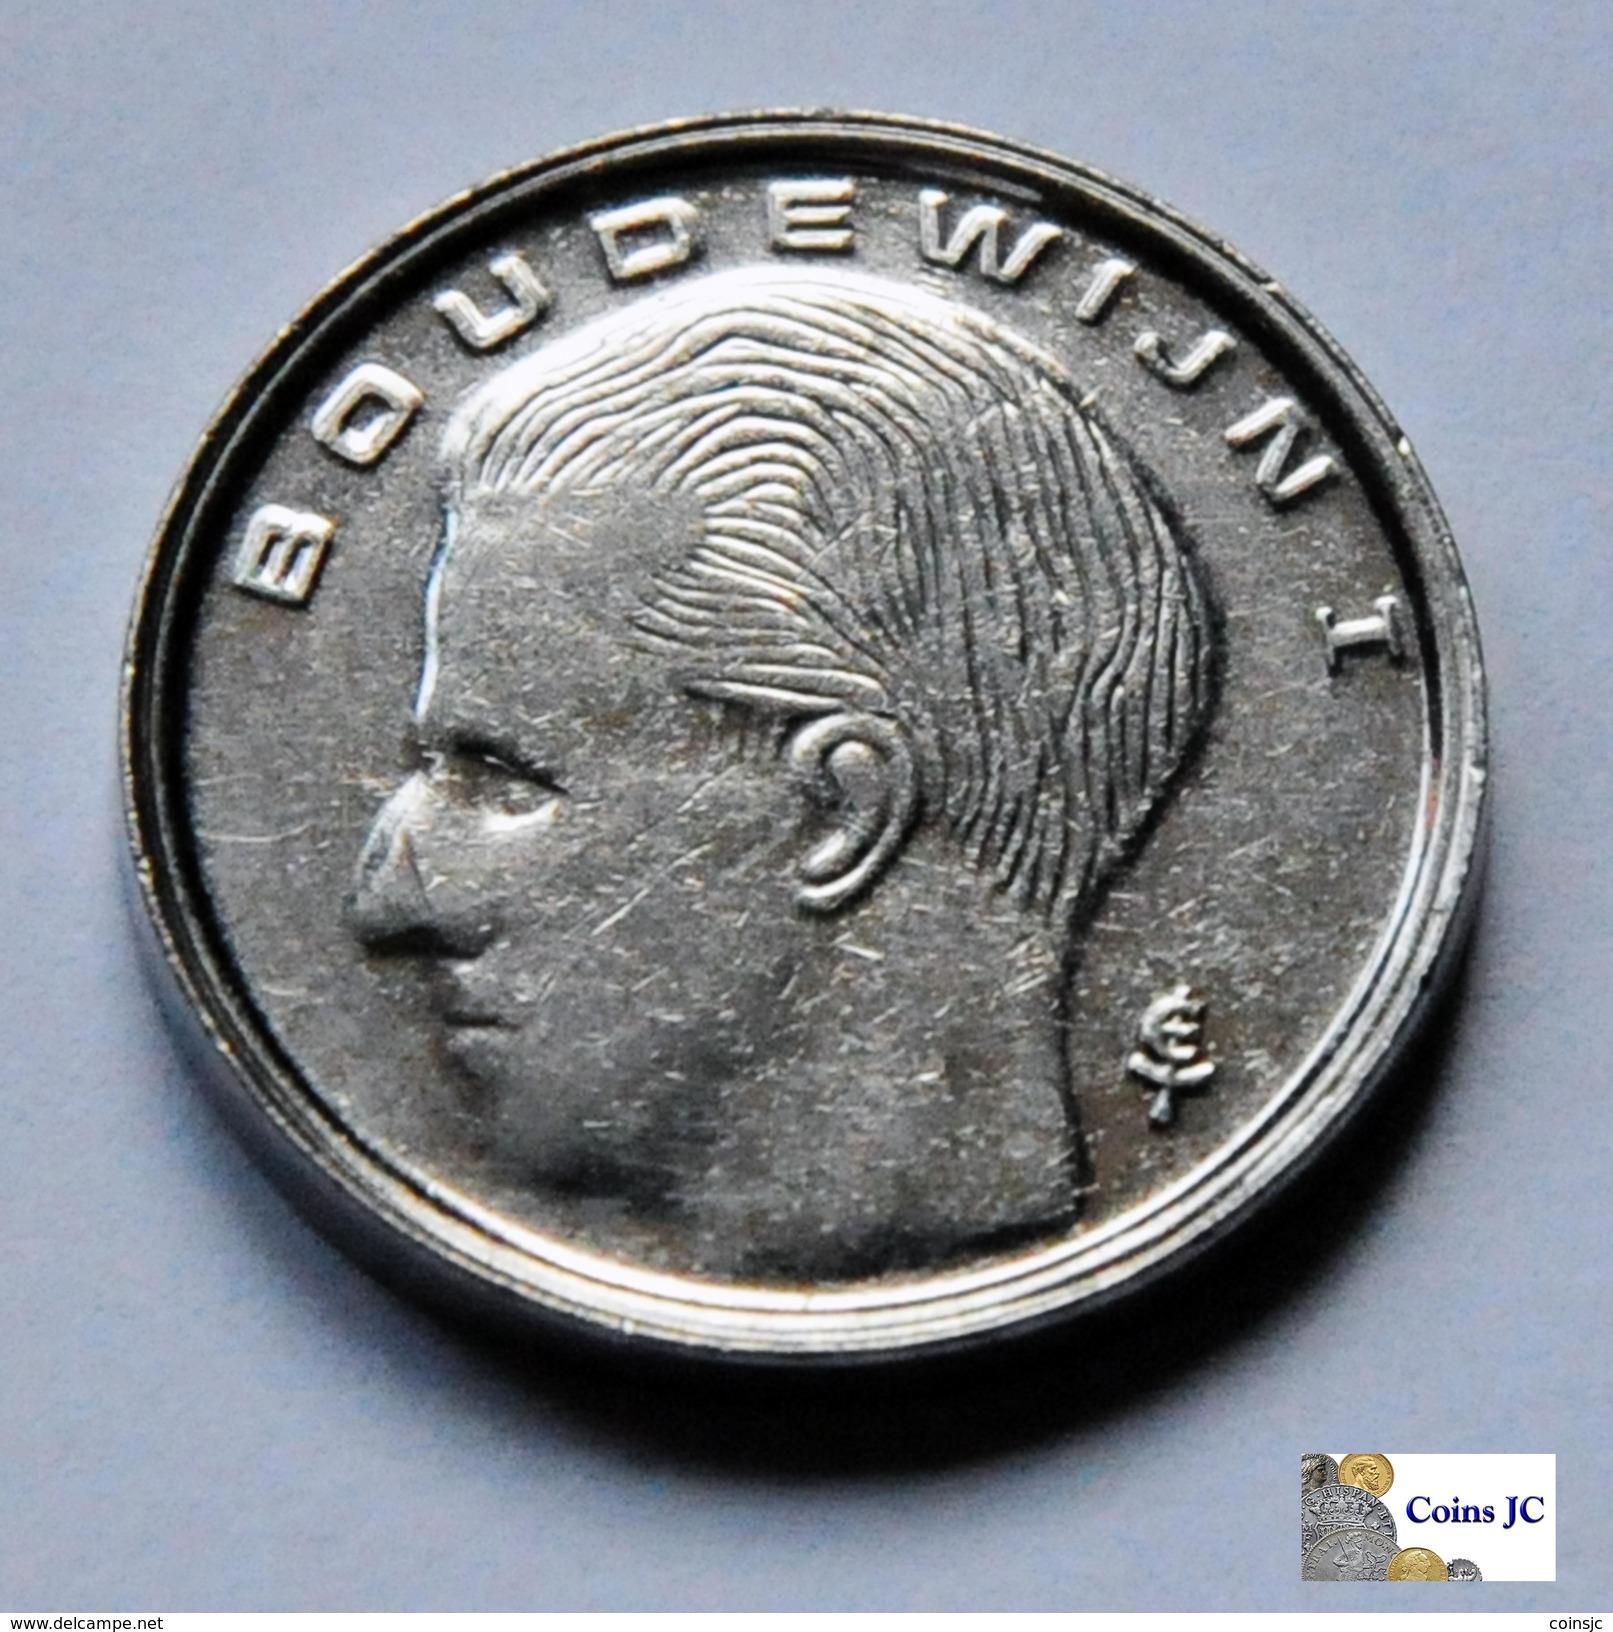 Bélgica - 1 Franc - 1989 - 1951-1993: Baudouin I